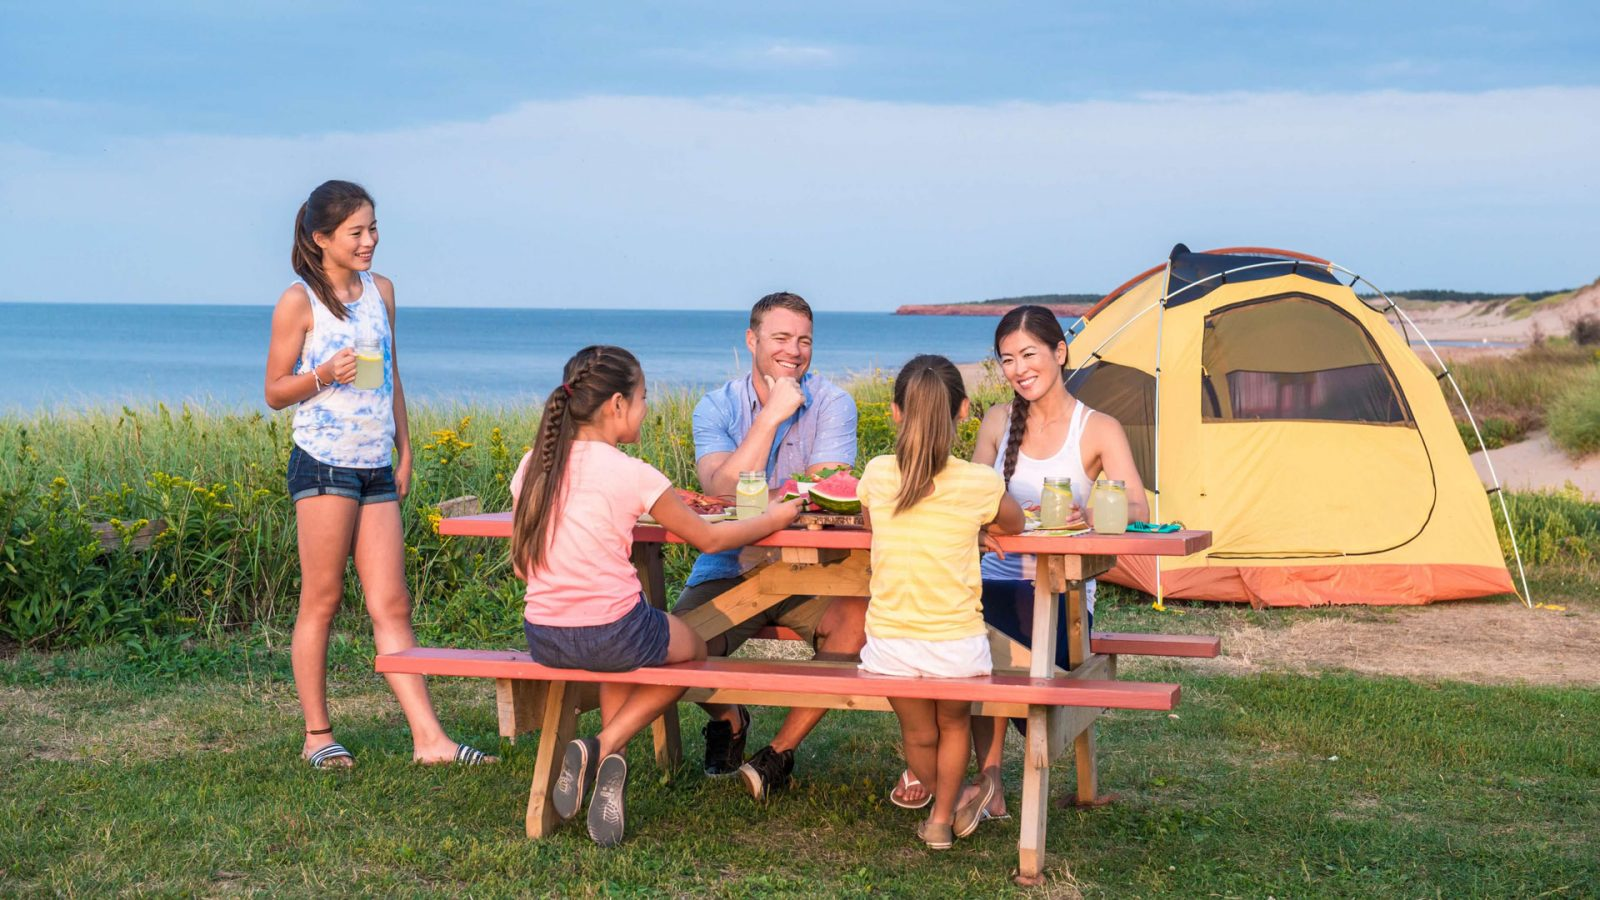 Family at picnic table eating